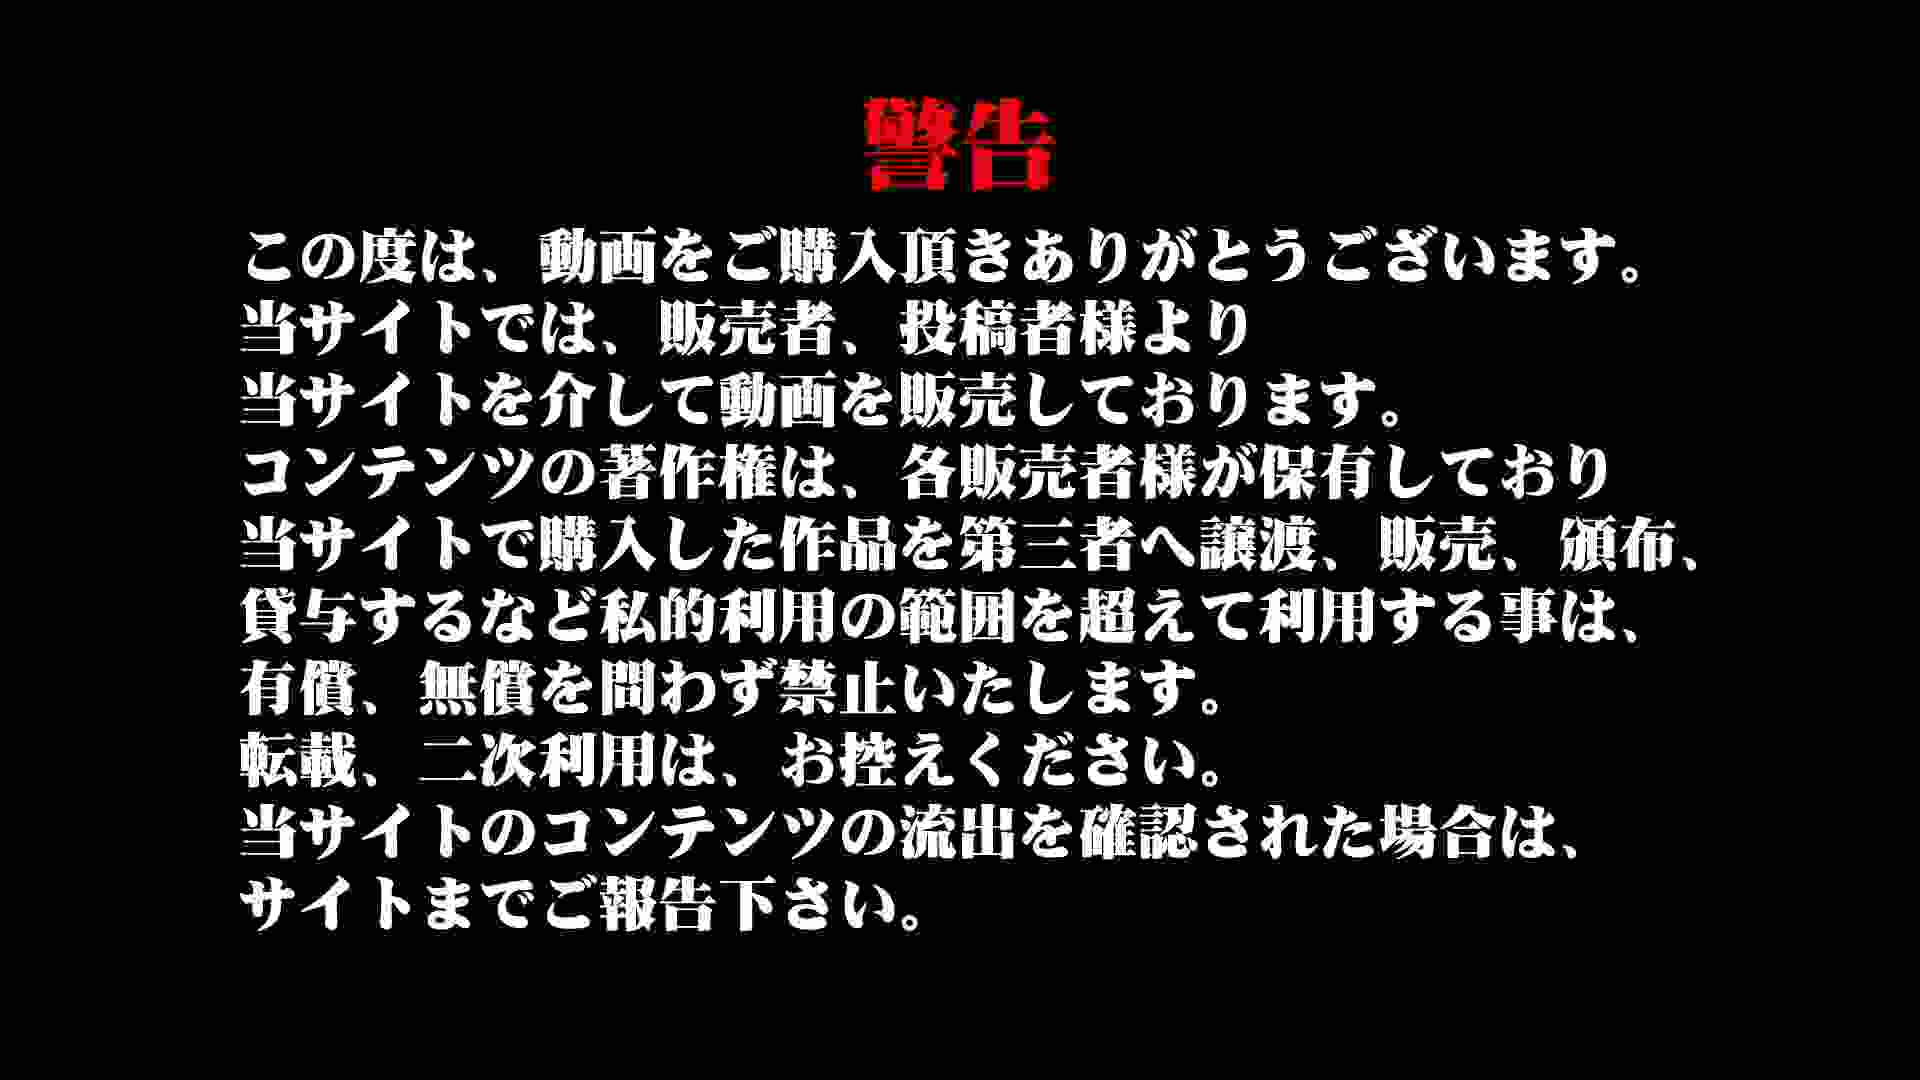 Aquaな露天風呂Vol.906 露天風呂編 | 盗撮シリーズ  86PIX 3